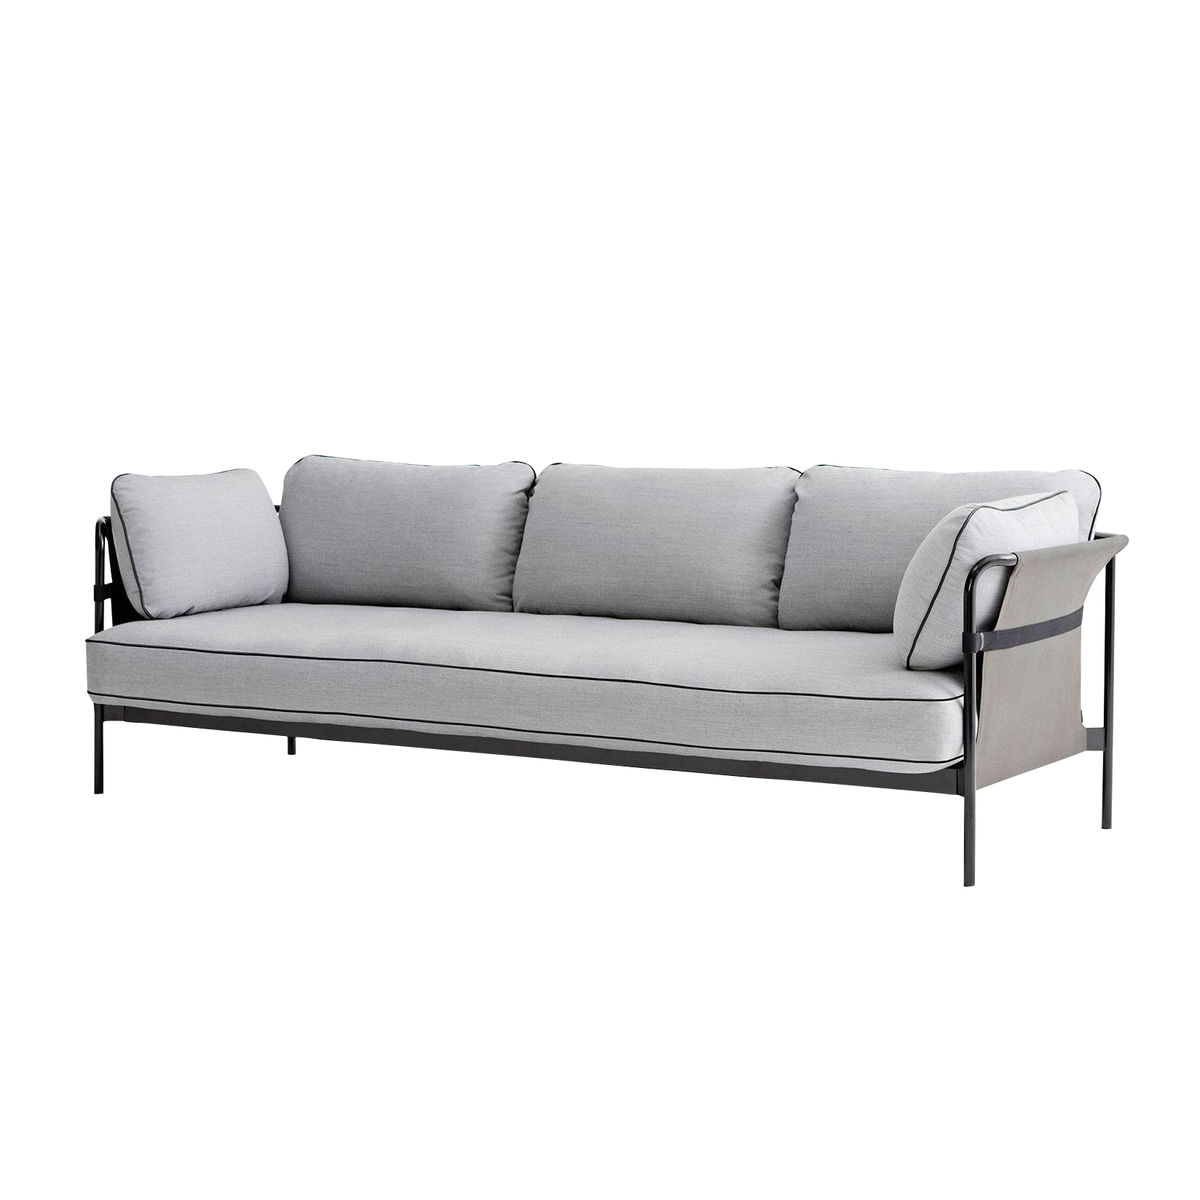 hay can 3 sitzer sofa hellgraustoff surface 120247x82x89 - Couch Grau Stoff